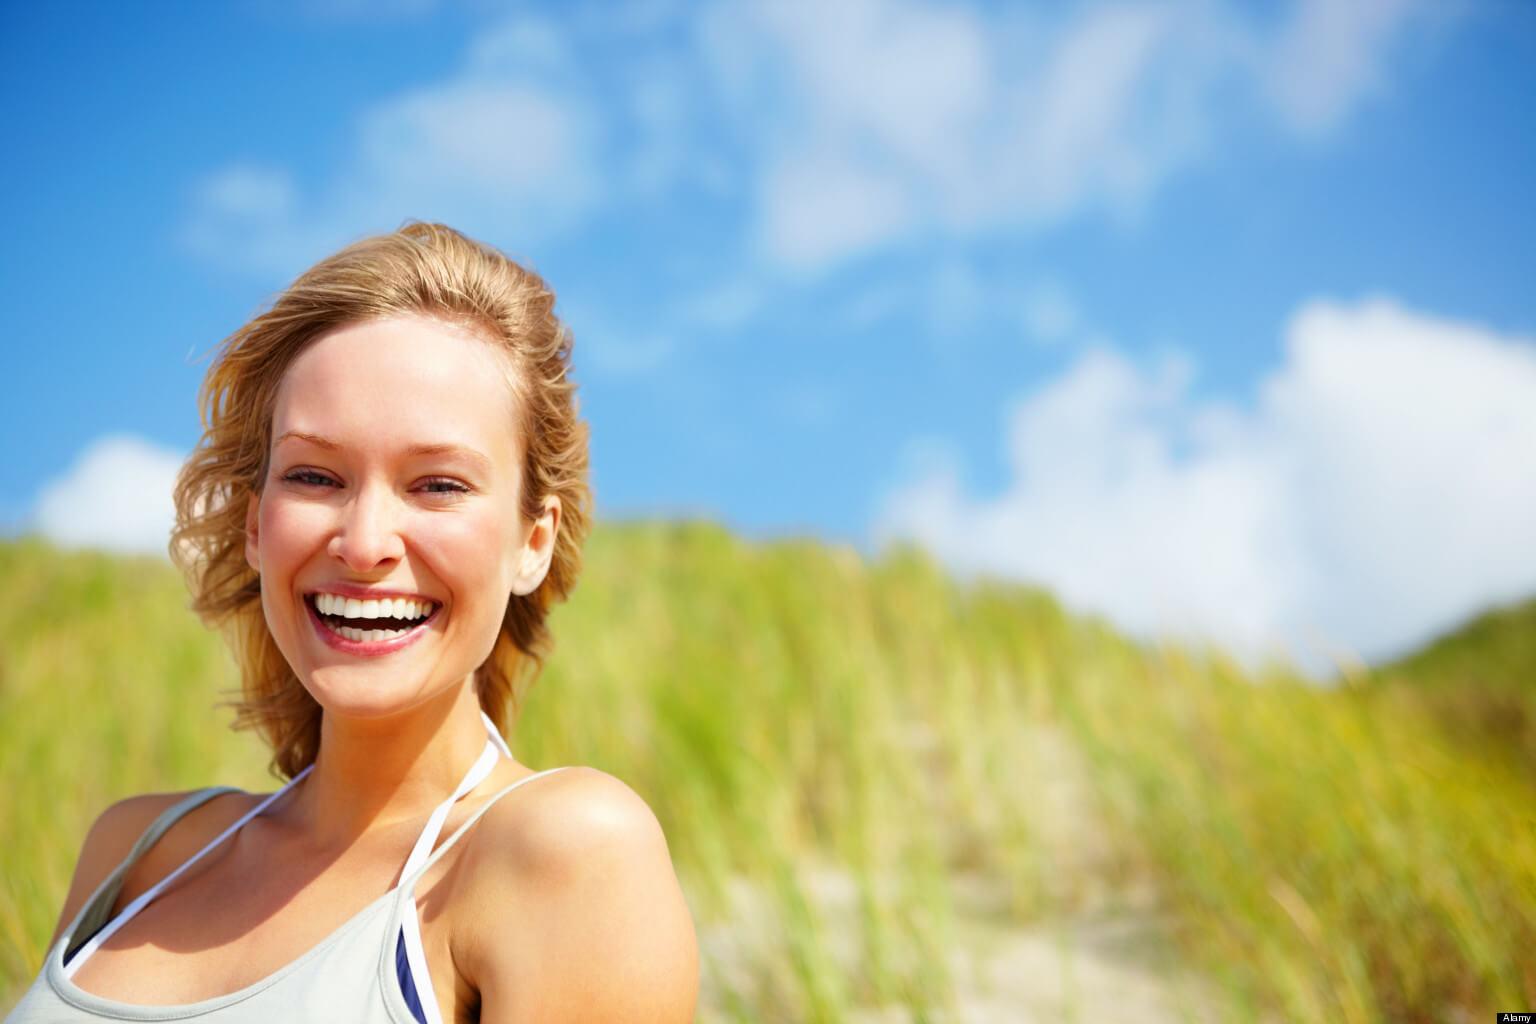 BFWRDJ Pretty happy woman smiling